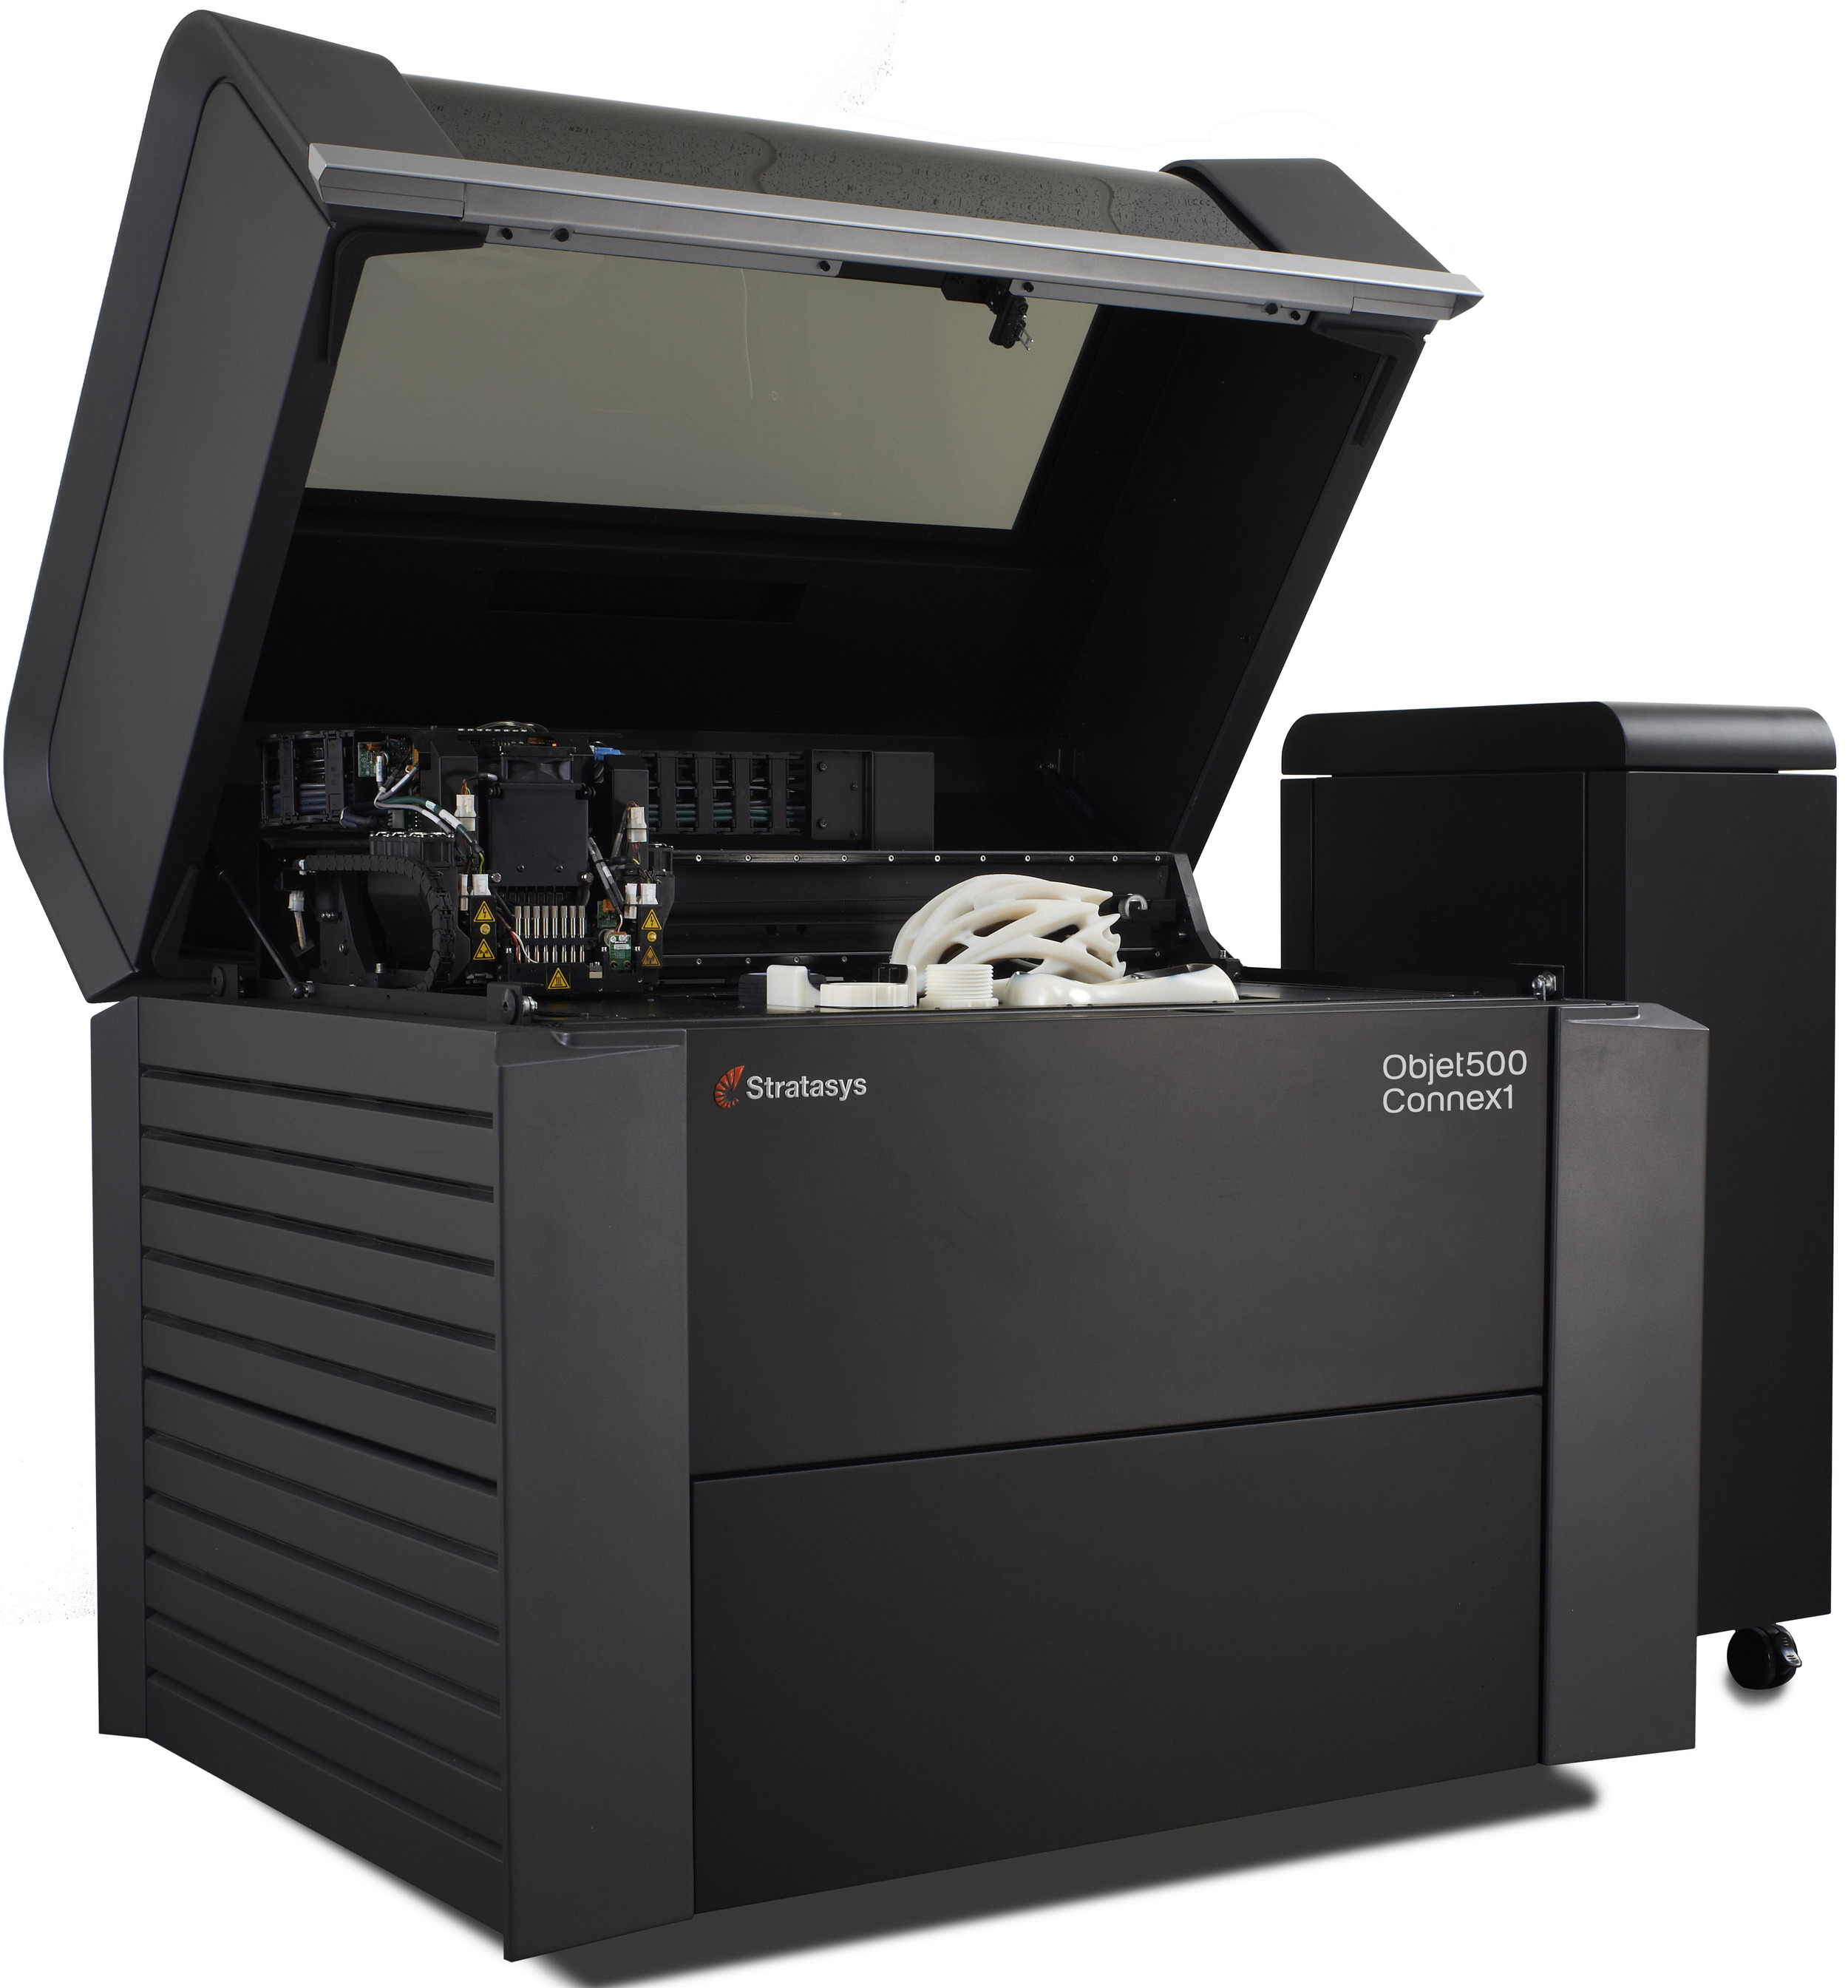 Stratasys Enhances Triple Jet 3D Printing